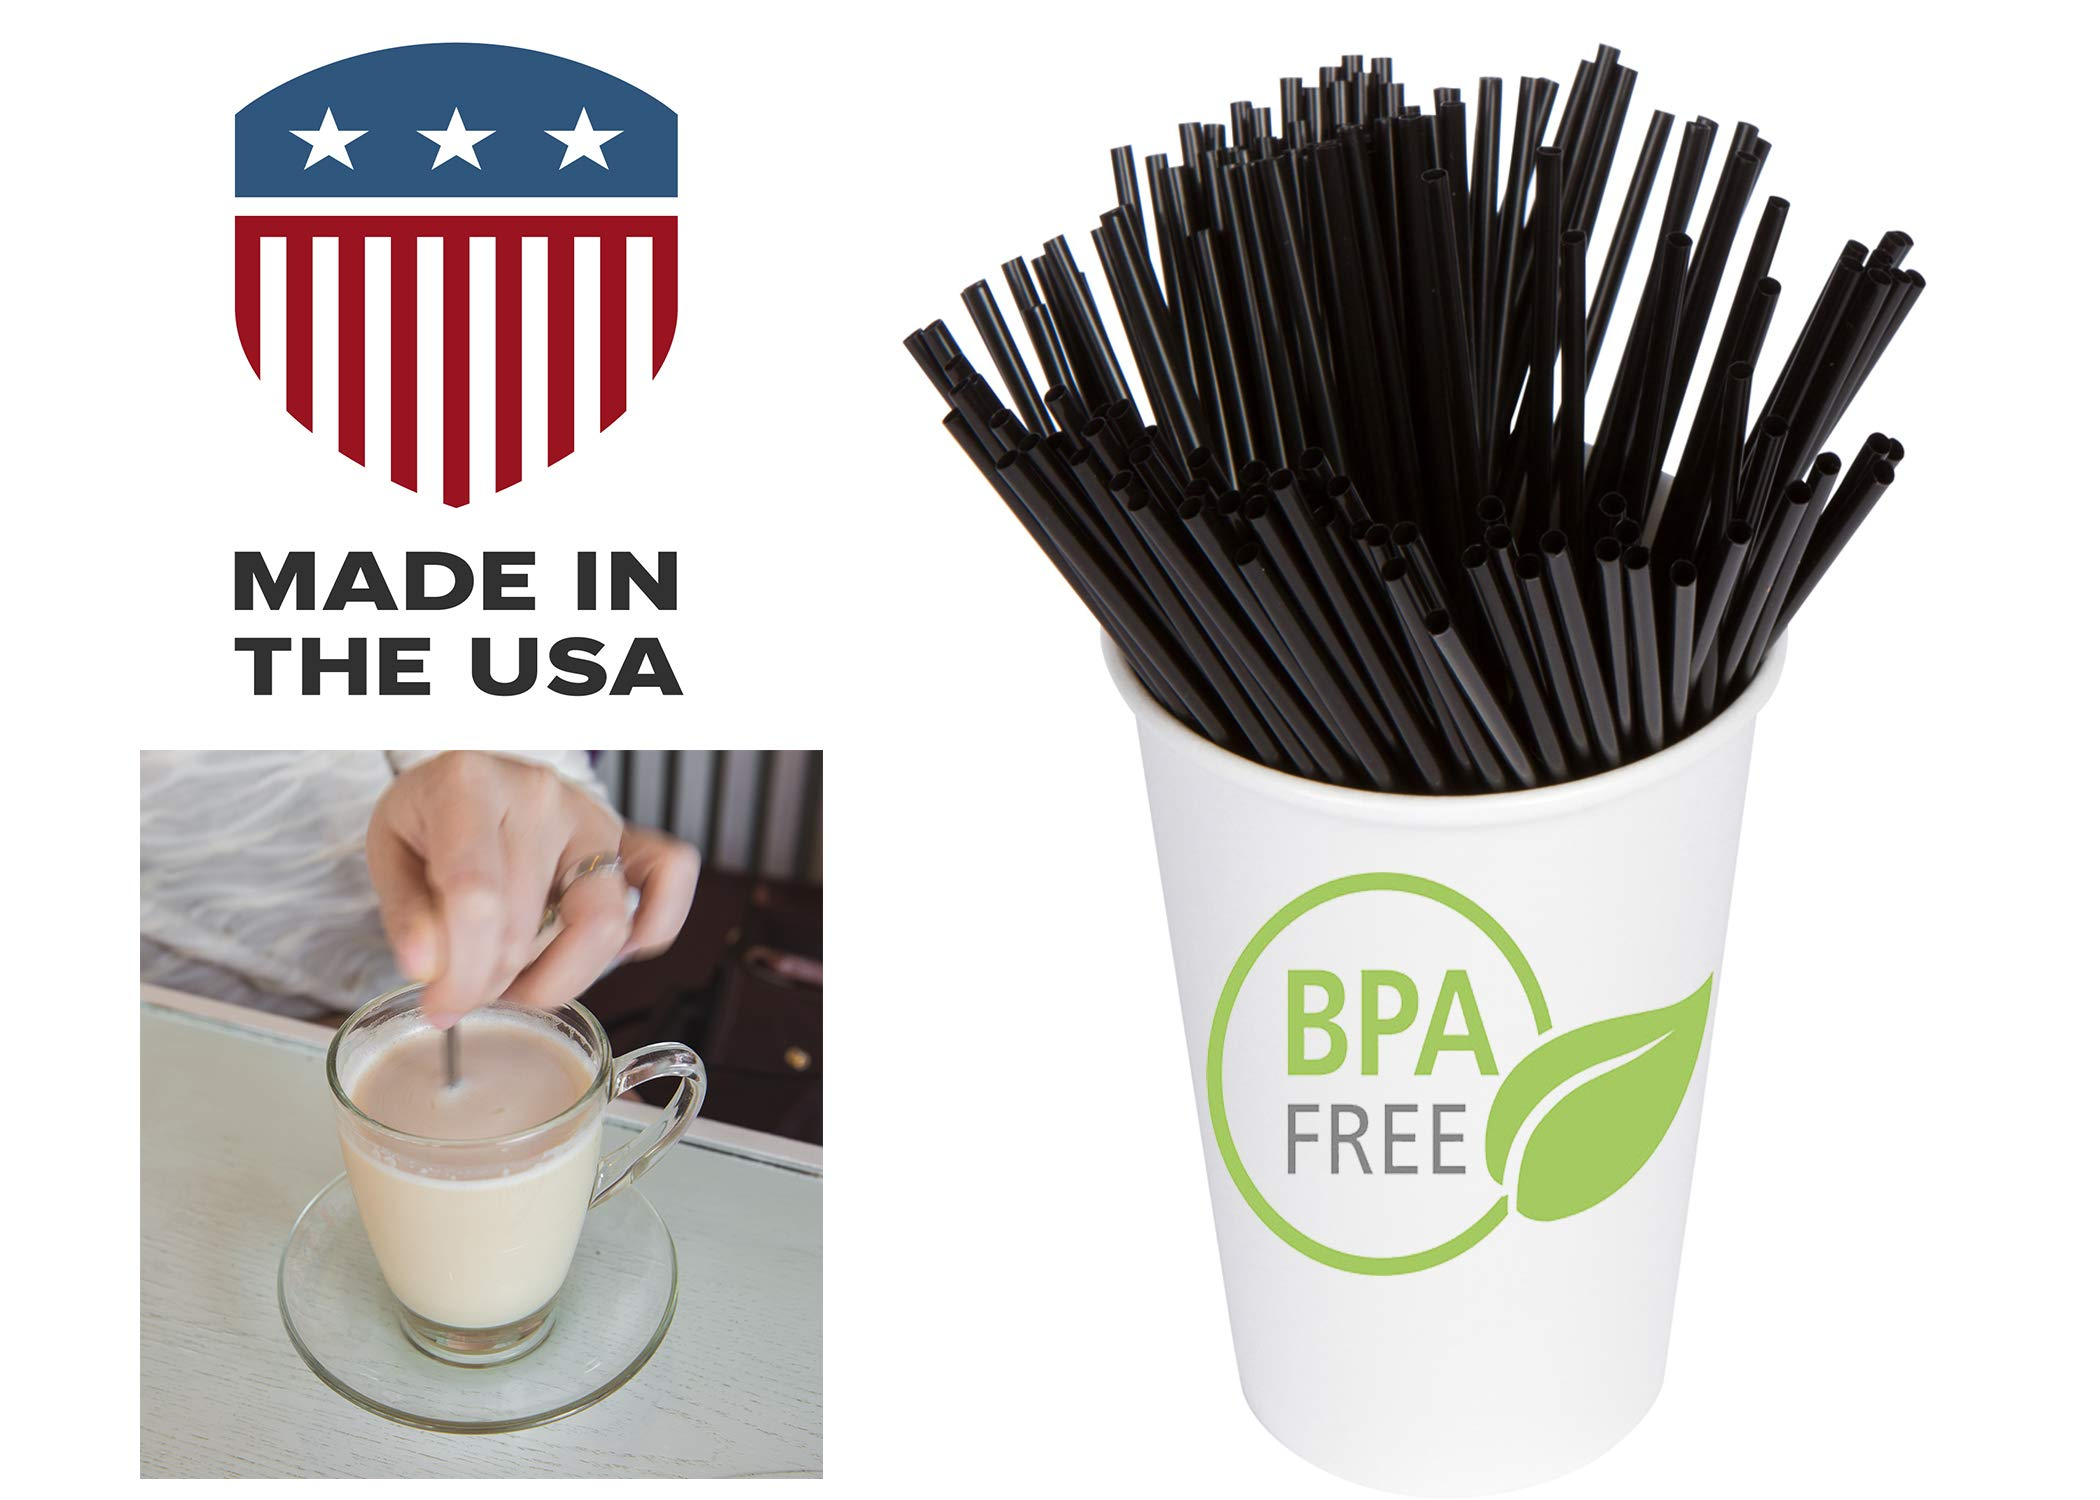 Coffee Stir Sticks, Plastic Stirrers: USA Made, BPA Free: Cocktail Straws, 5.25'' Black, 1000ct by Alexius (Image #6)